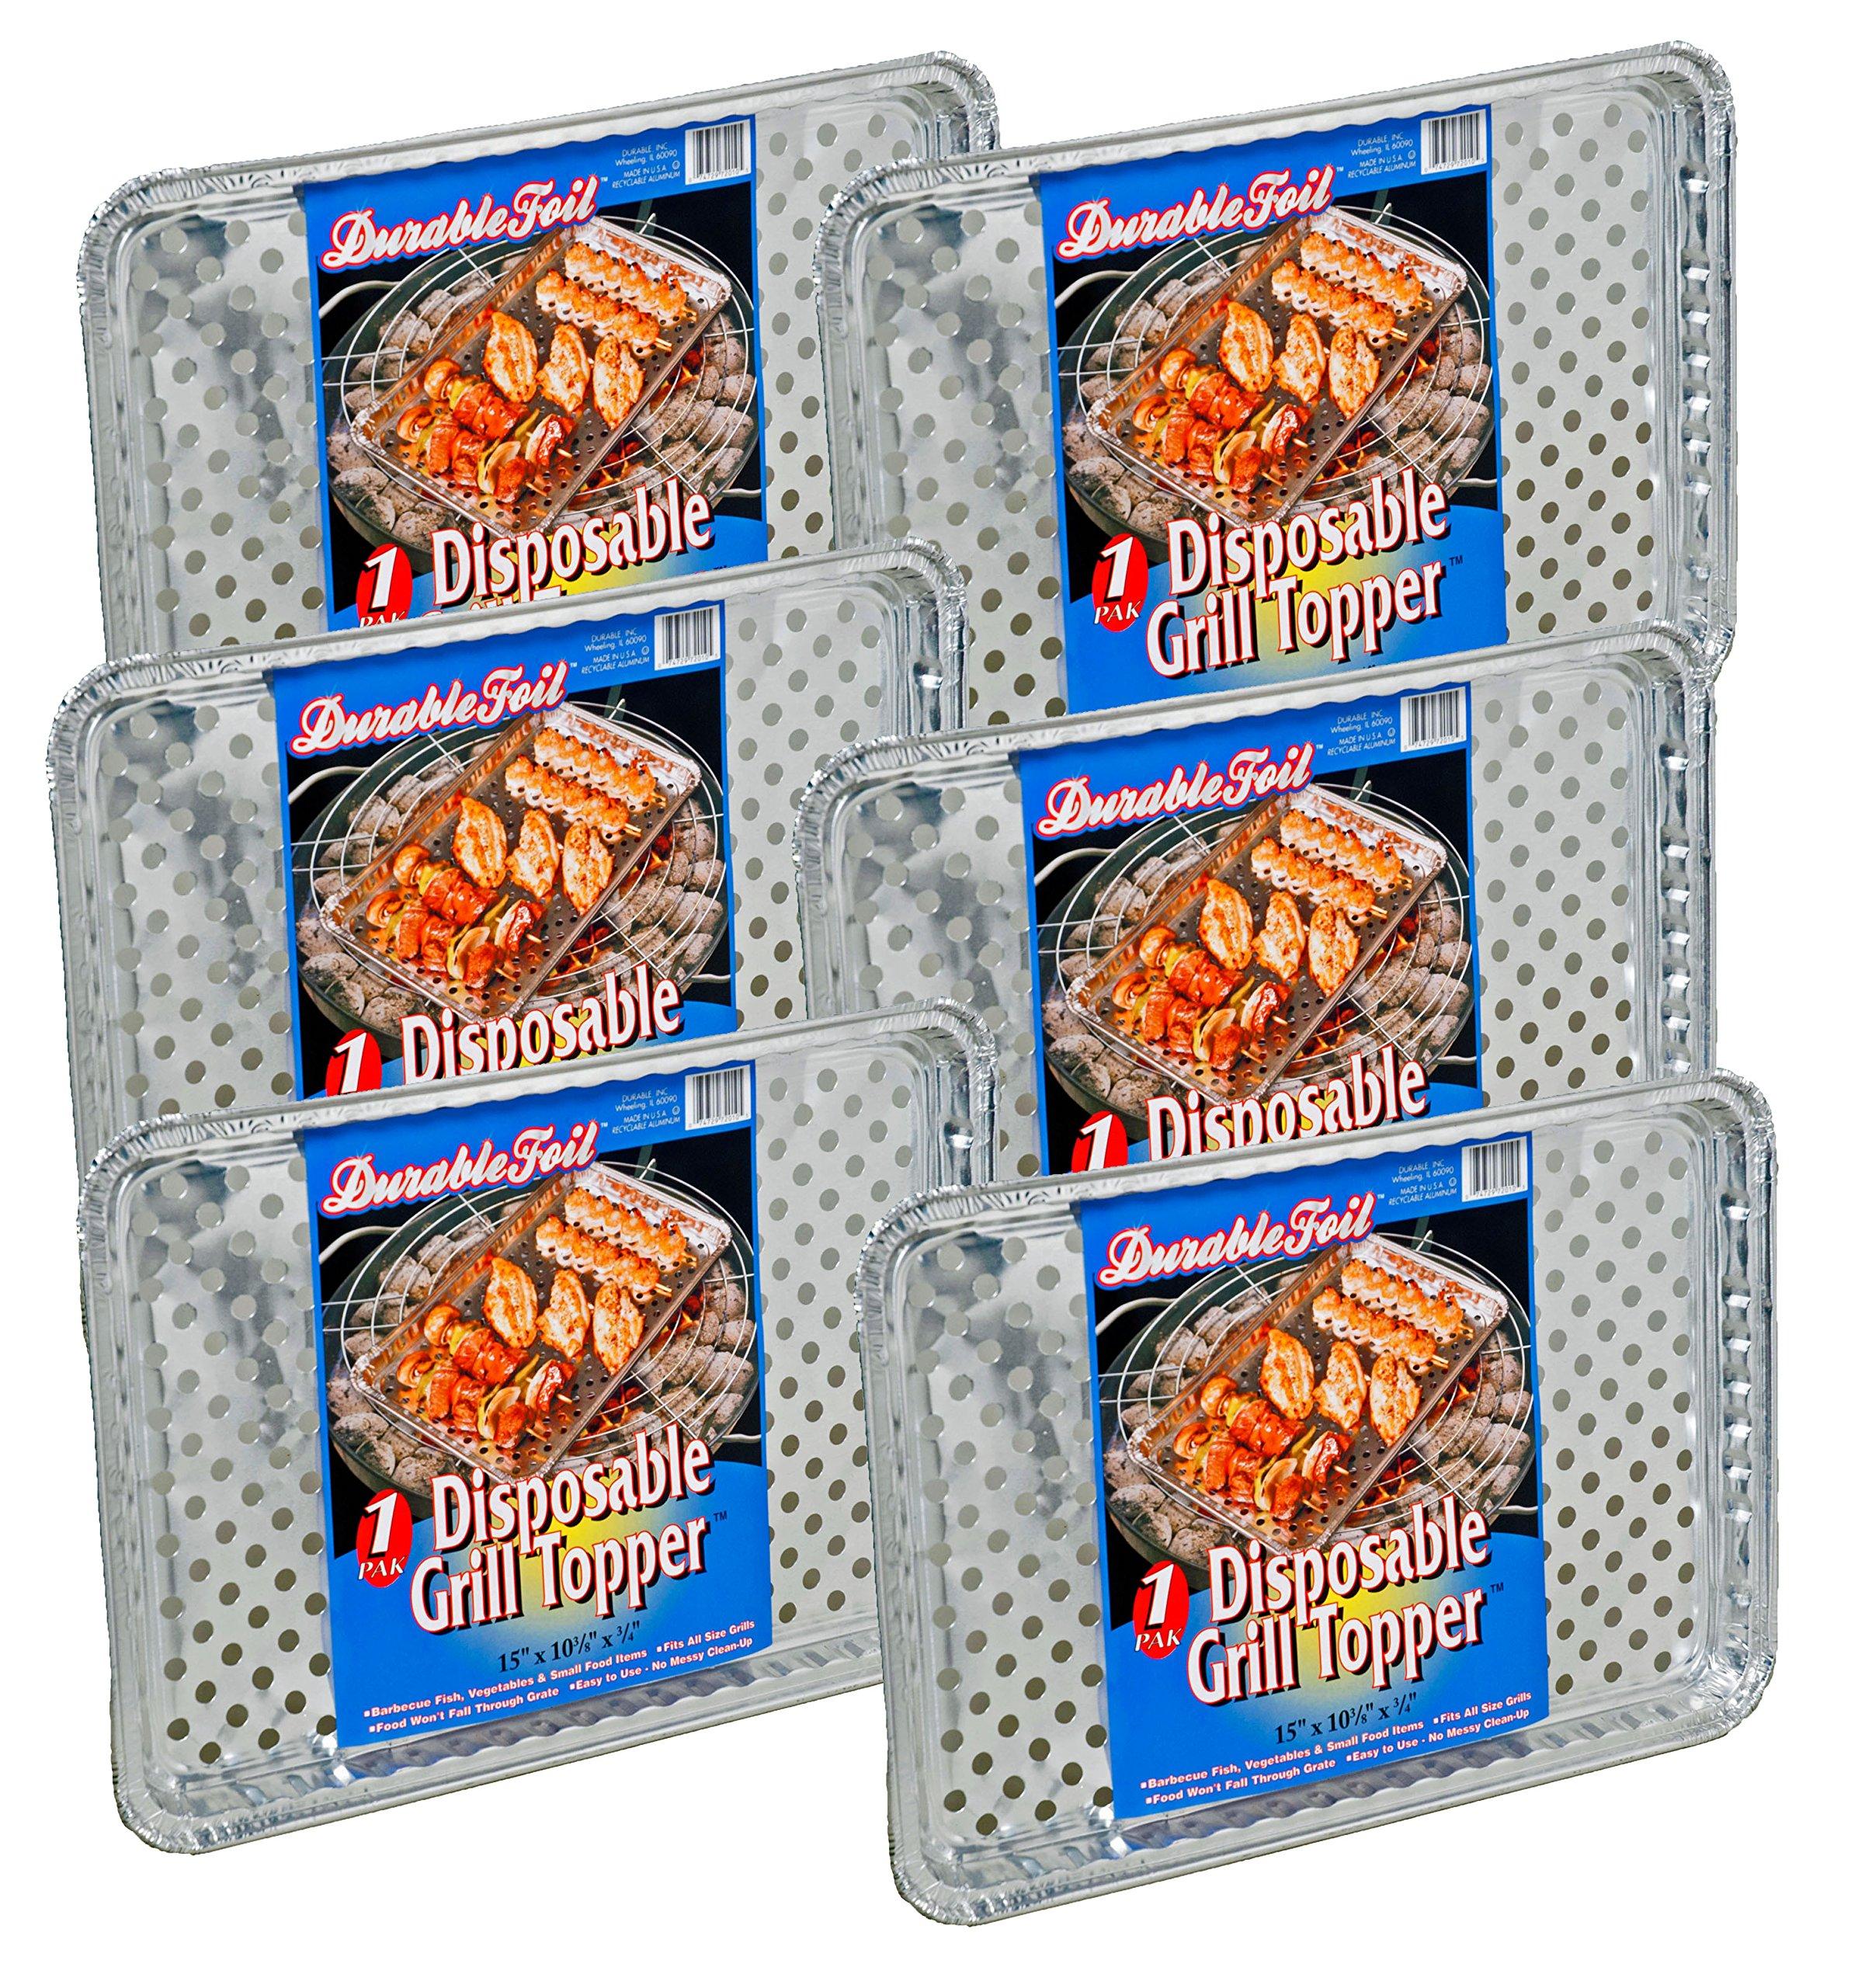 Set of 12 Durable Foil Disposable Deep Grill Topper Pans 11 3/4'' L x 9 1/4'' W x 1 1/2'' D by Durable (Image #2)